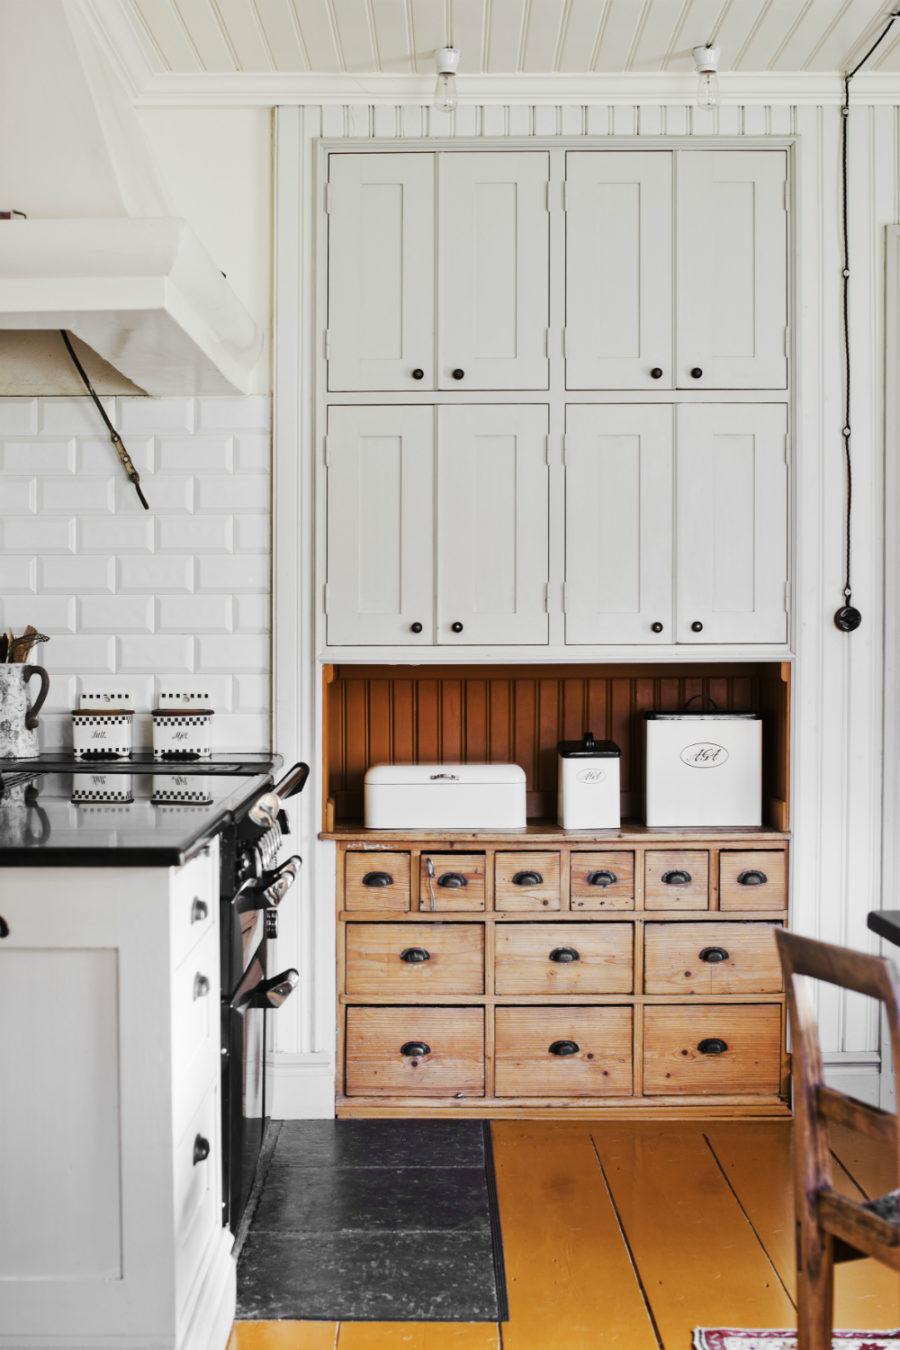 Repurpose cabinets